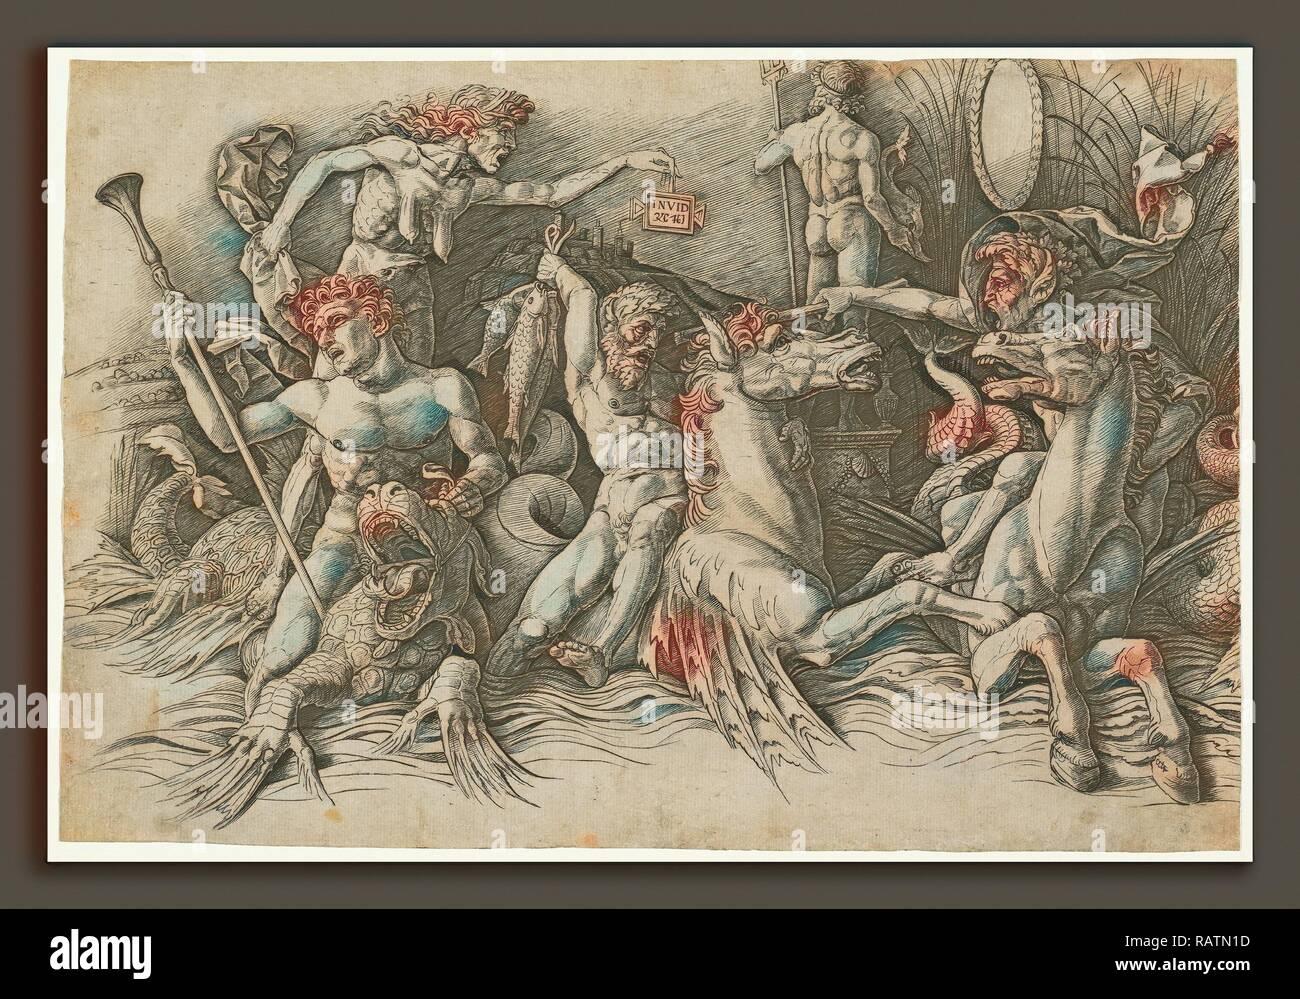 Andrea Mantegna (Italian, c. 1431 - 1506), Battle of the Sea Gods [left half], c. 1485-1488, engraving on laid paper reimagined - Stock Image